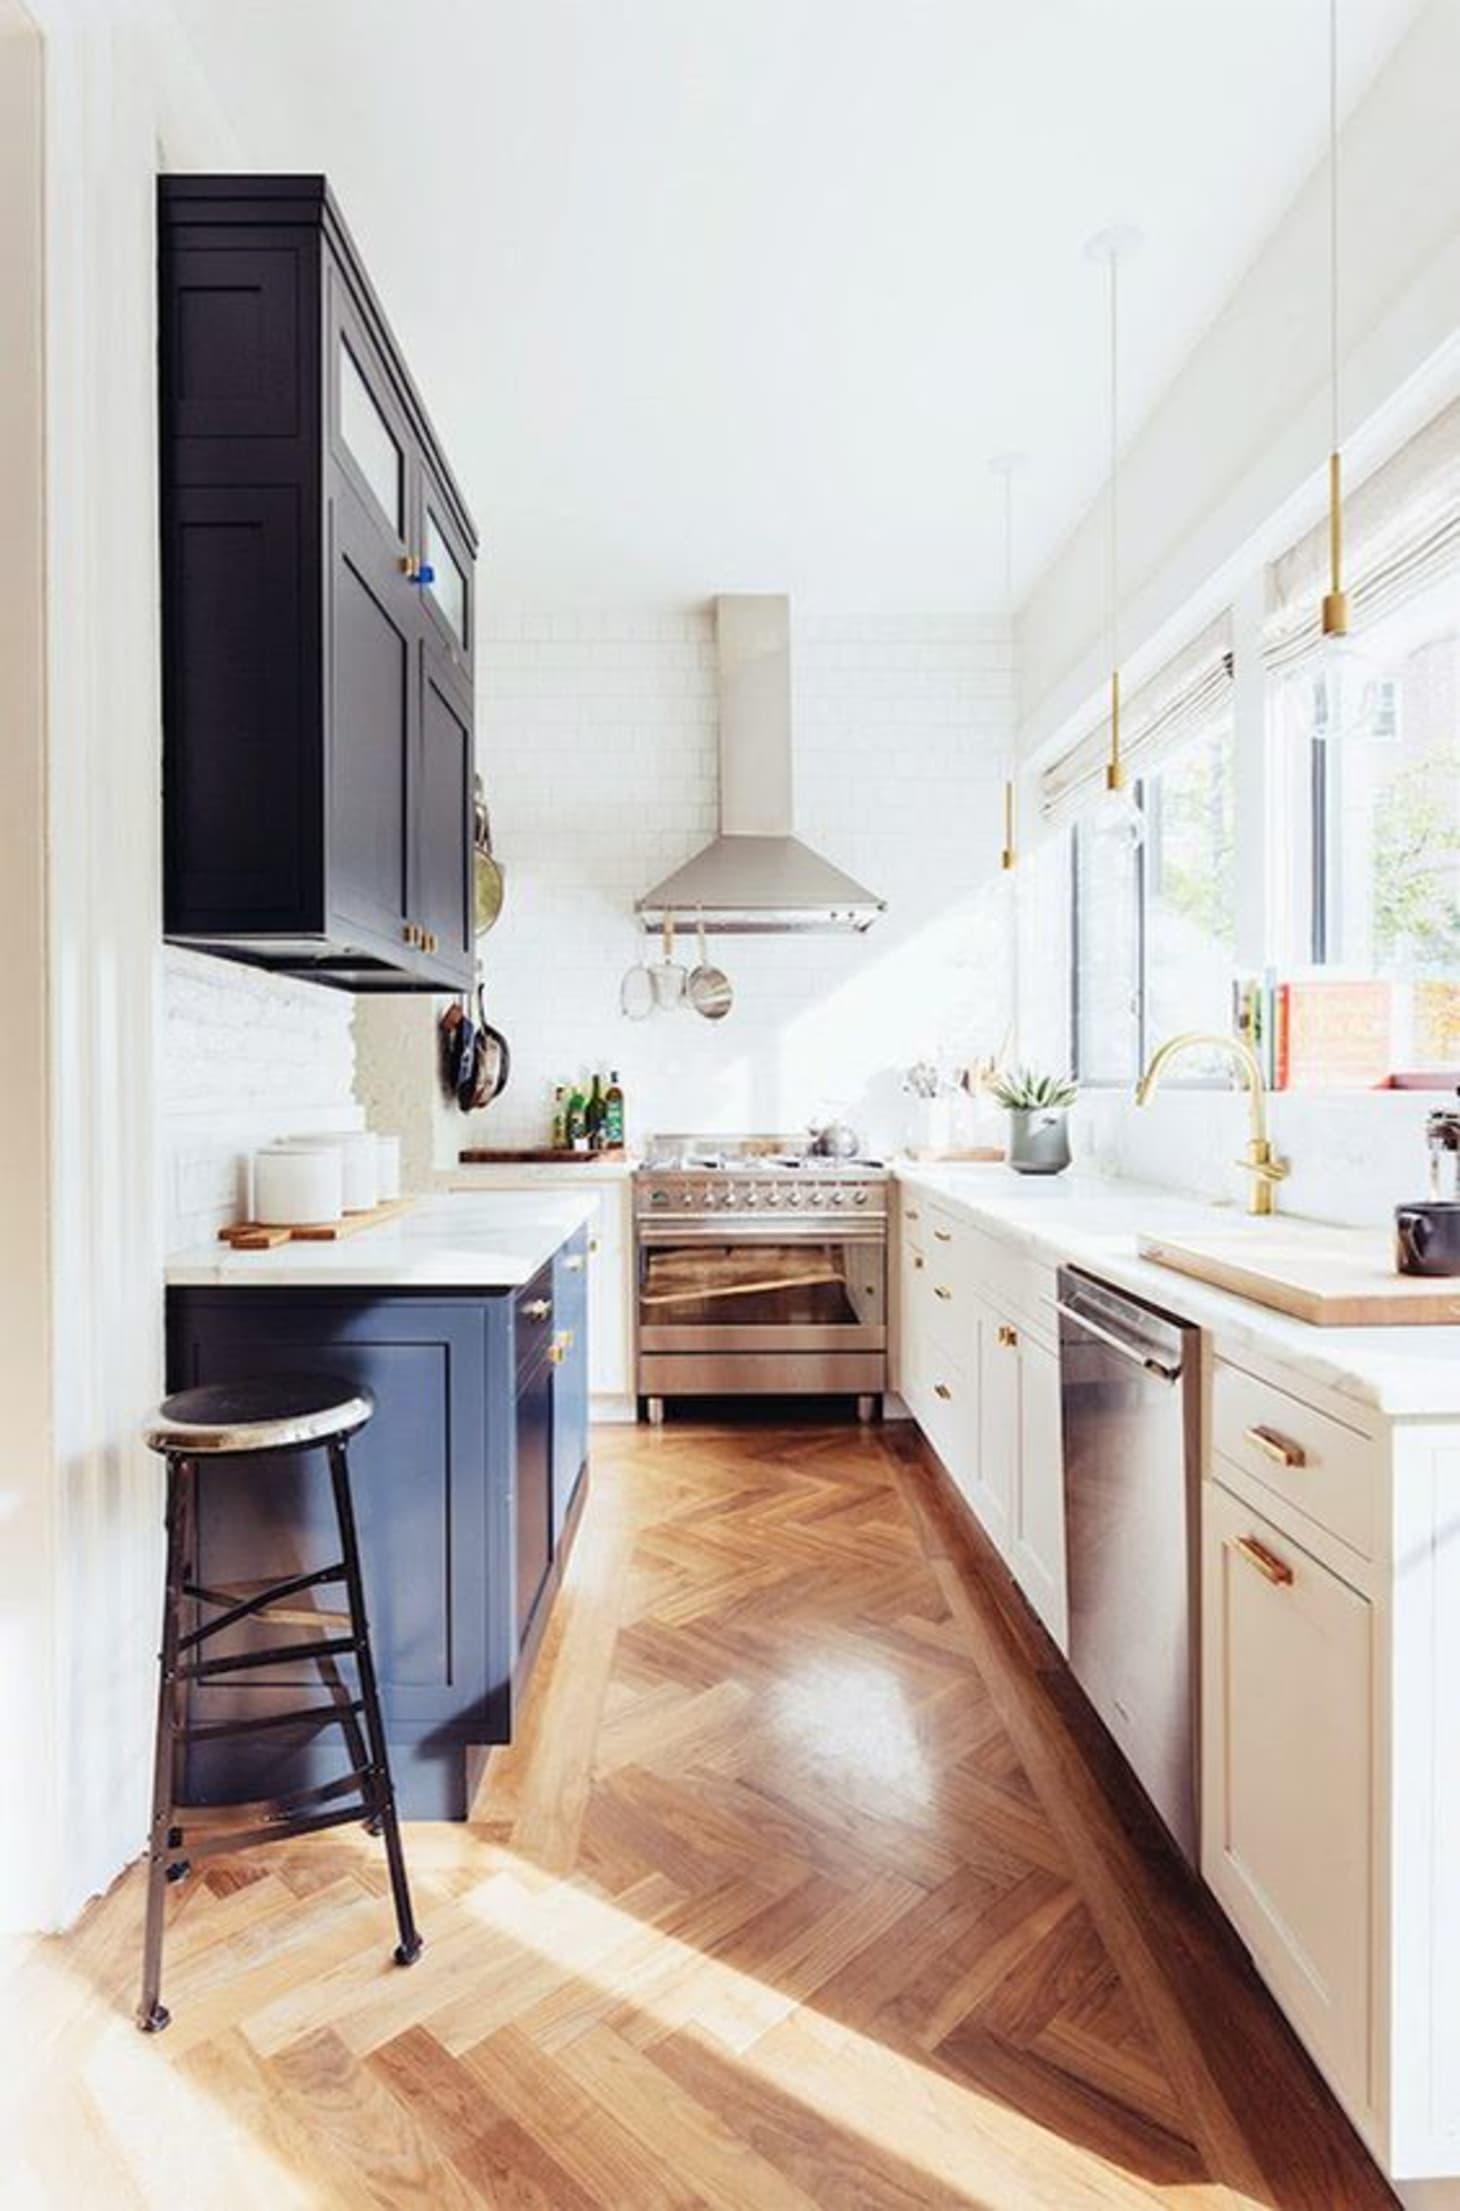 Galley Kitchen Small Space Small Kitchen Design Ideas